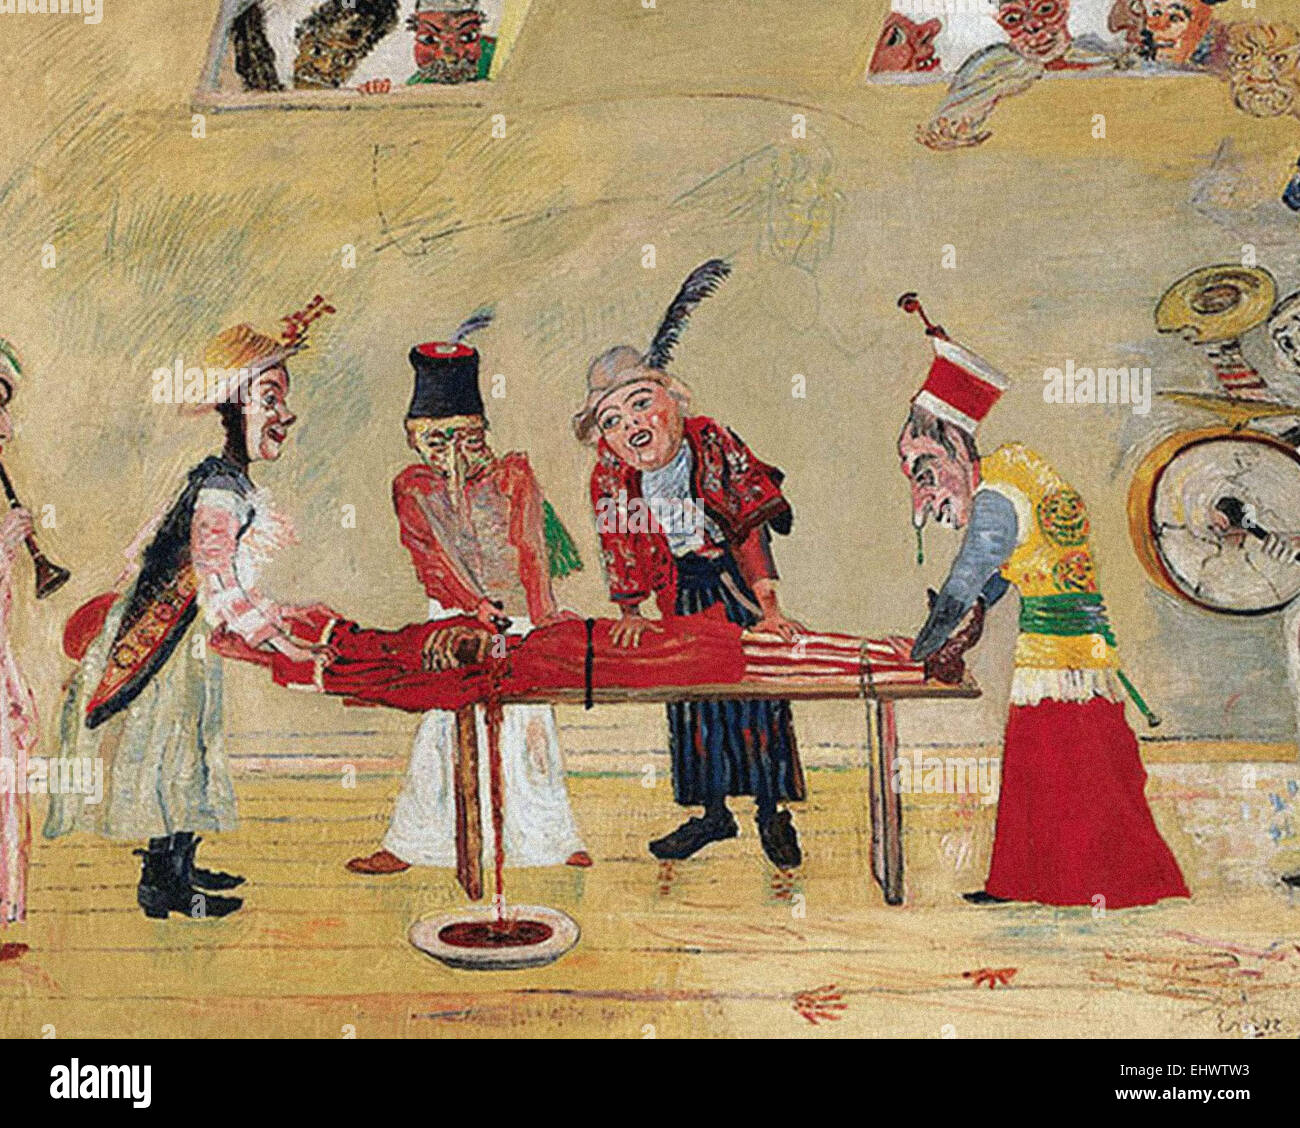 James Ensor  The Assassination - Stock Image